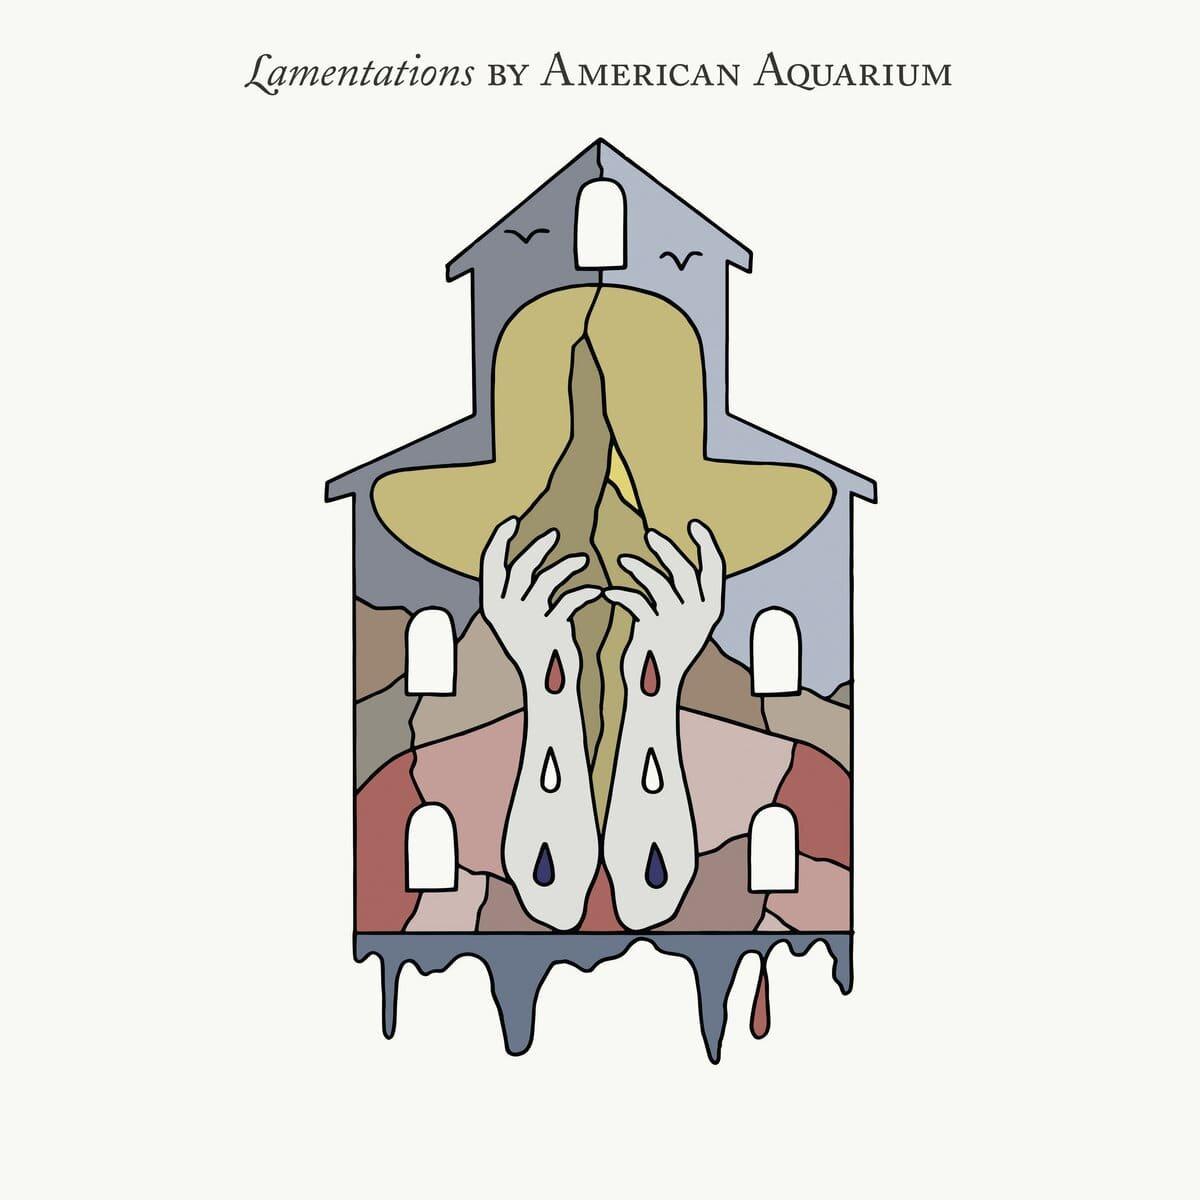 American Aquarium – Lamentations